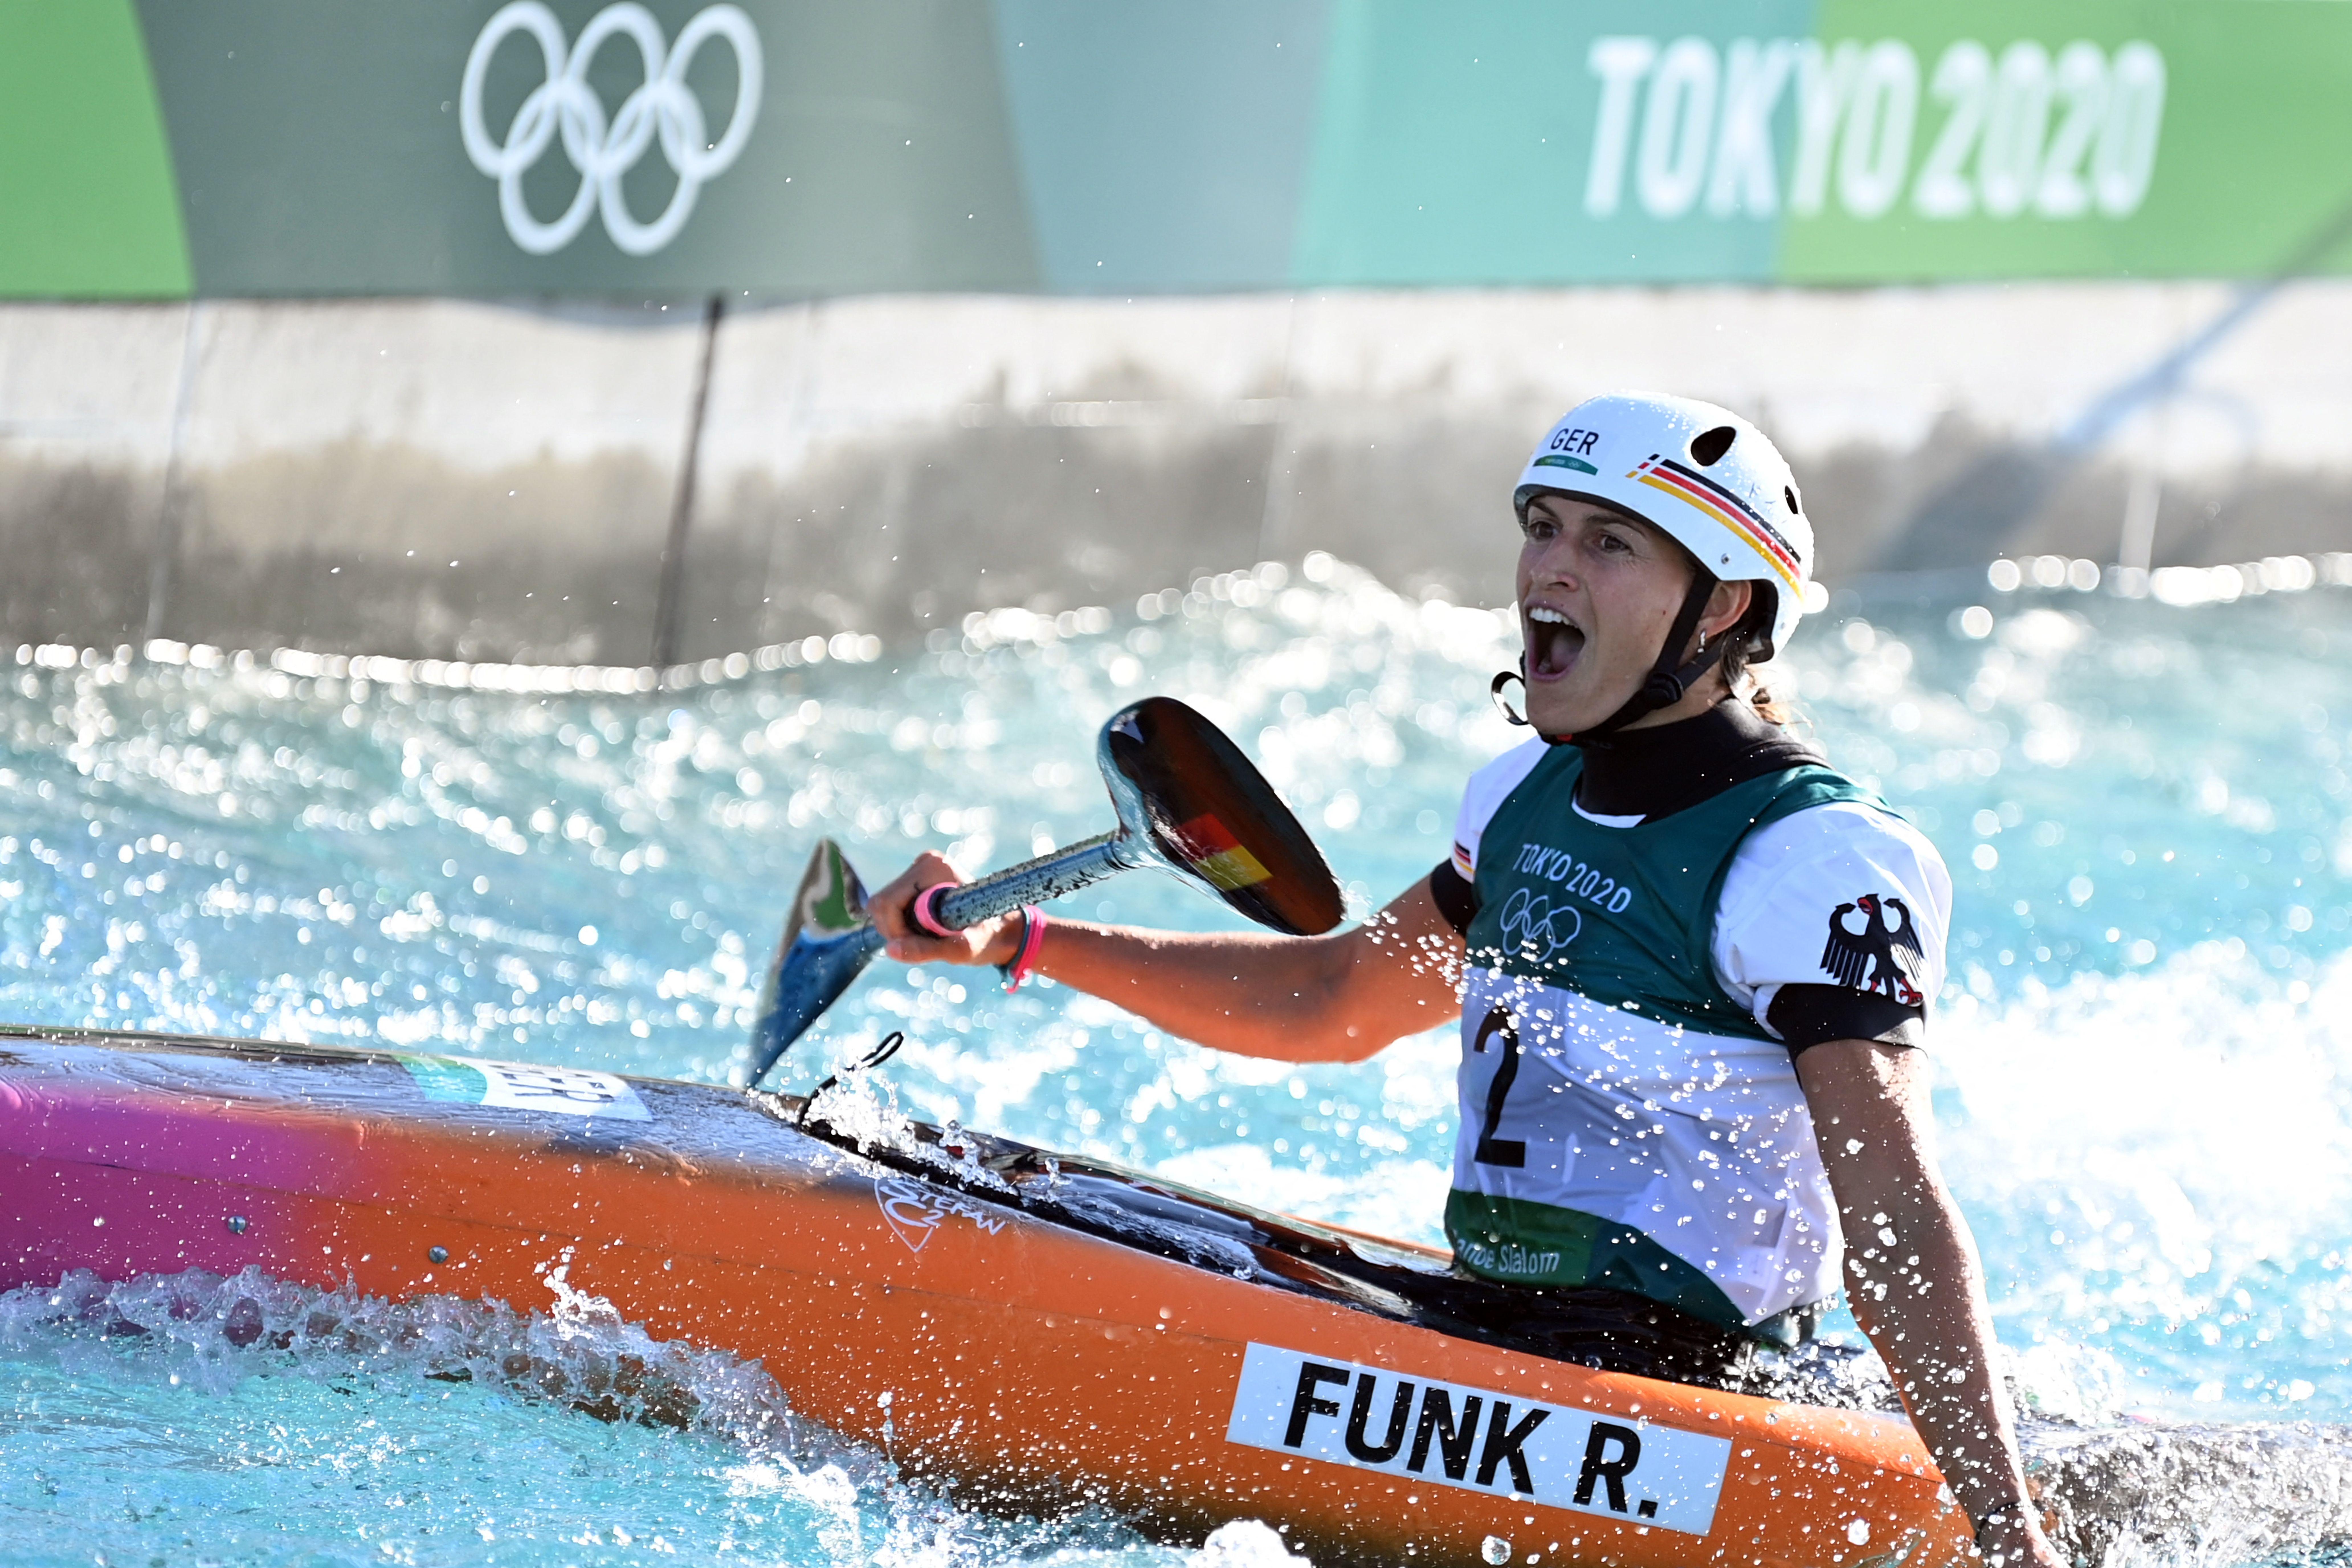 Ricarda Funk celebrates during the final of the canoe slalom.